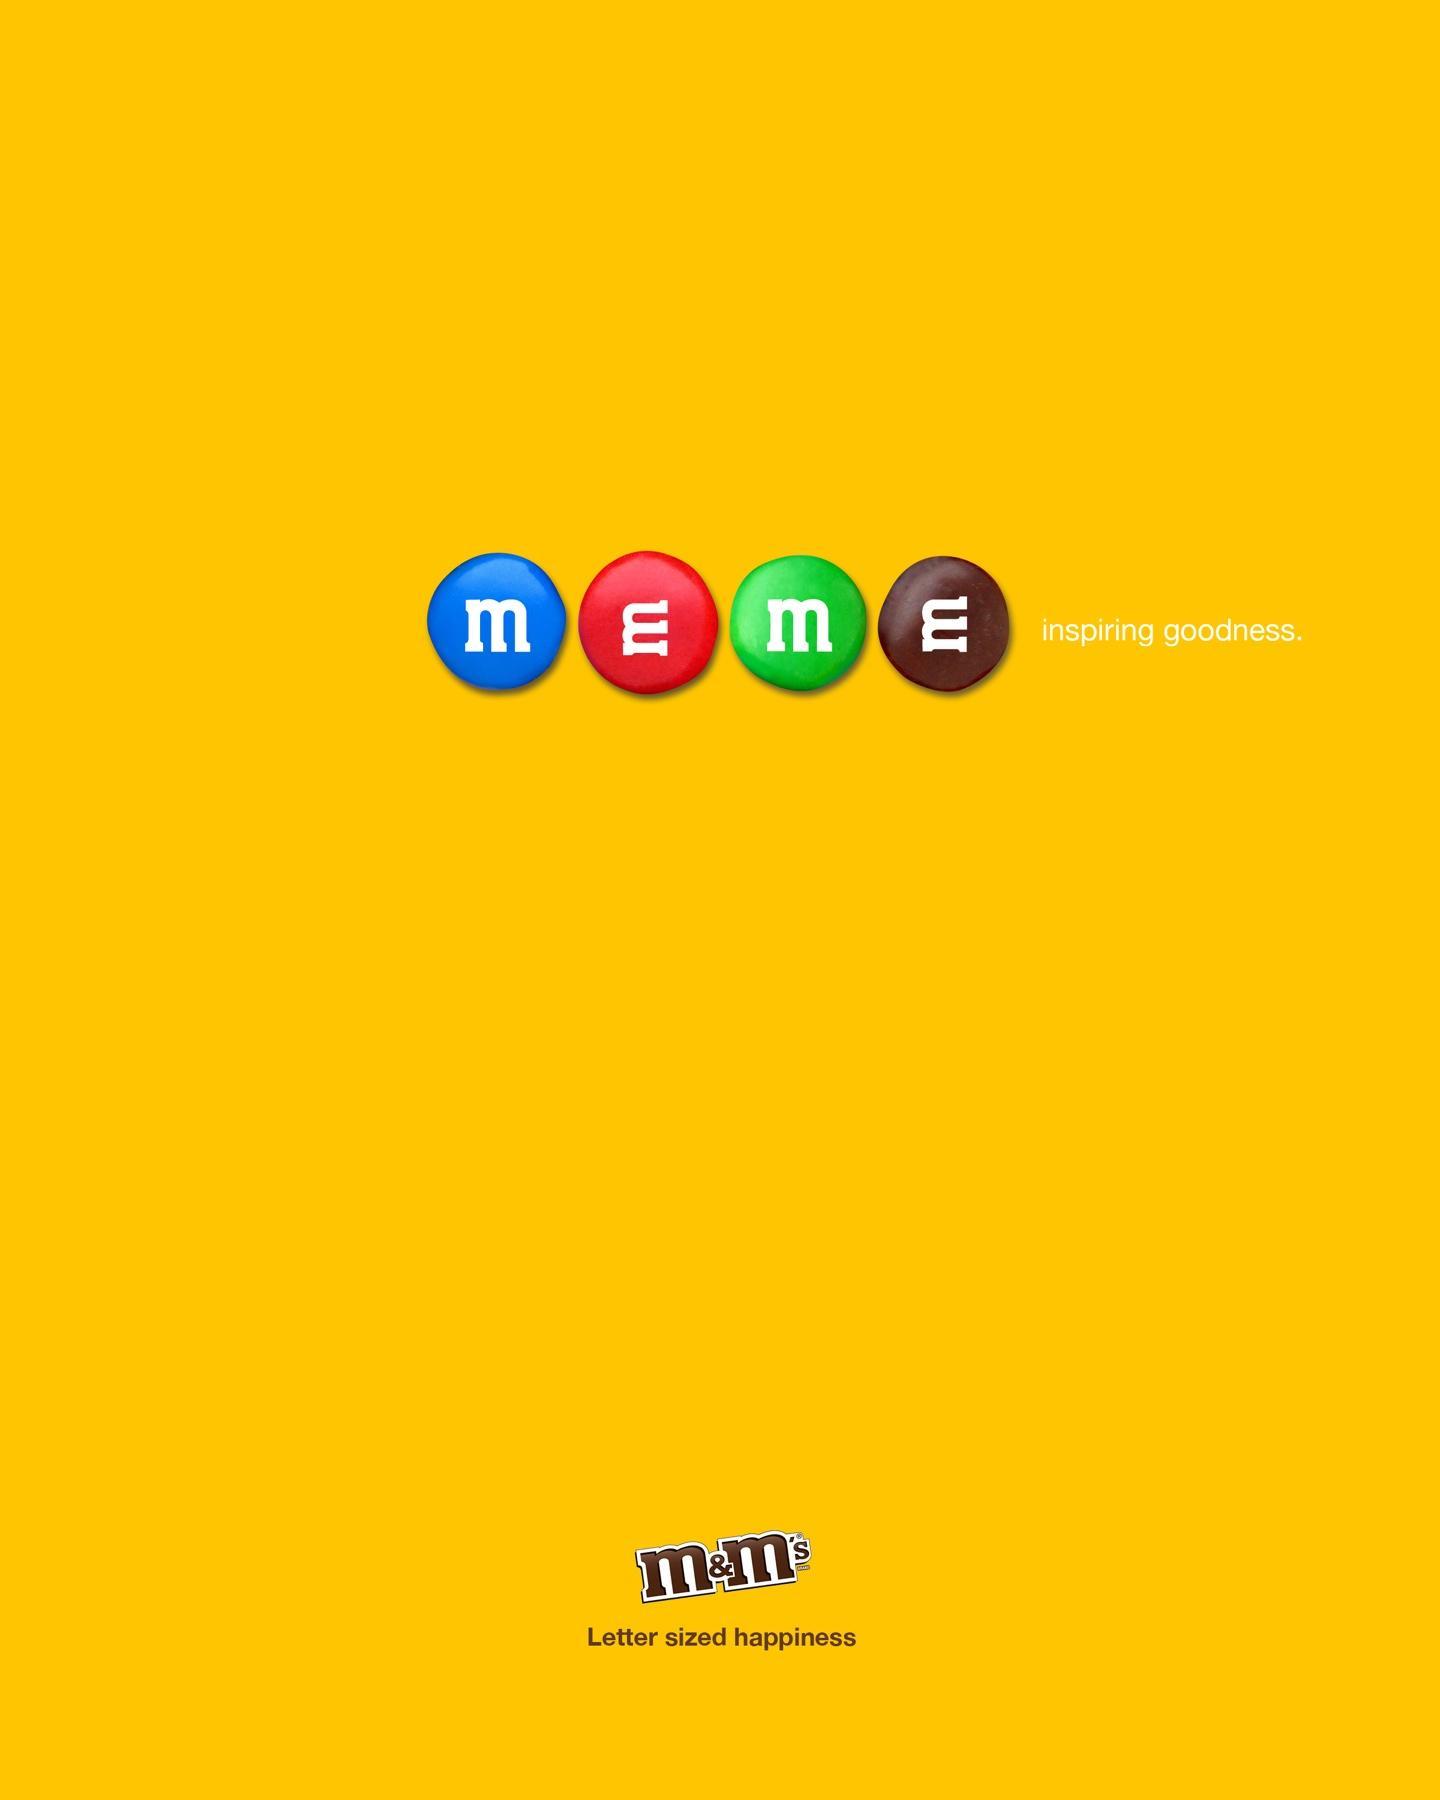 mms_3_aotw?itok=B63FbrMq m&m's print advert by meme ads of the world™